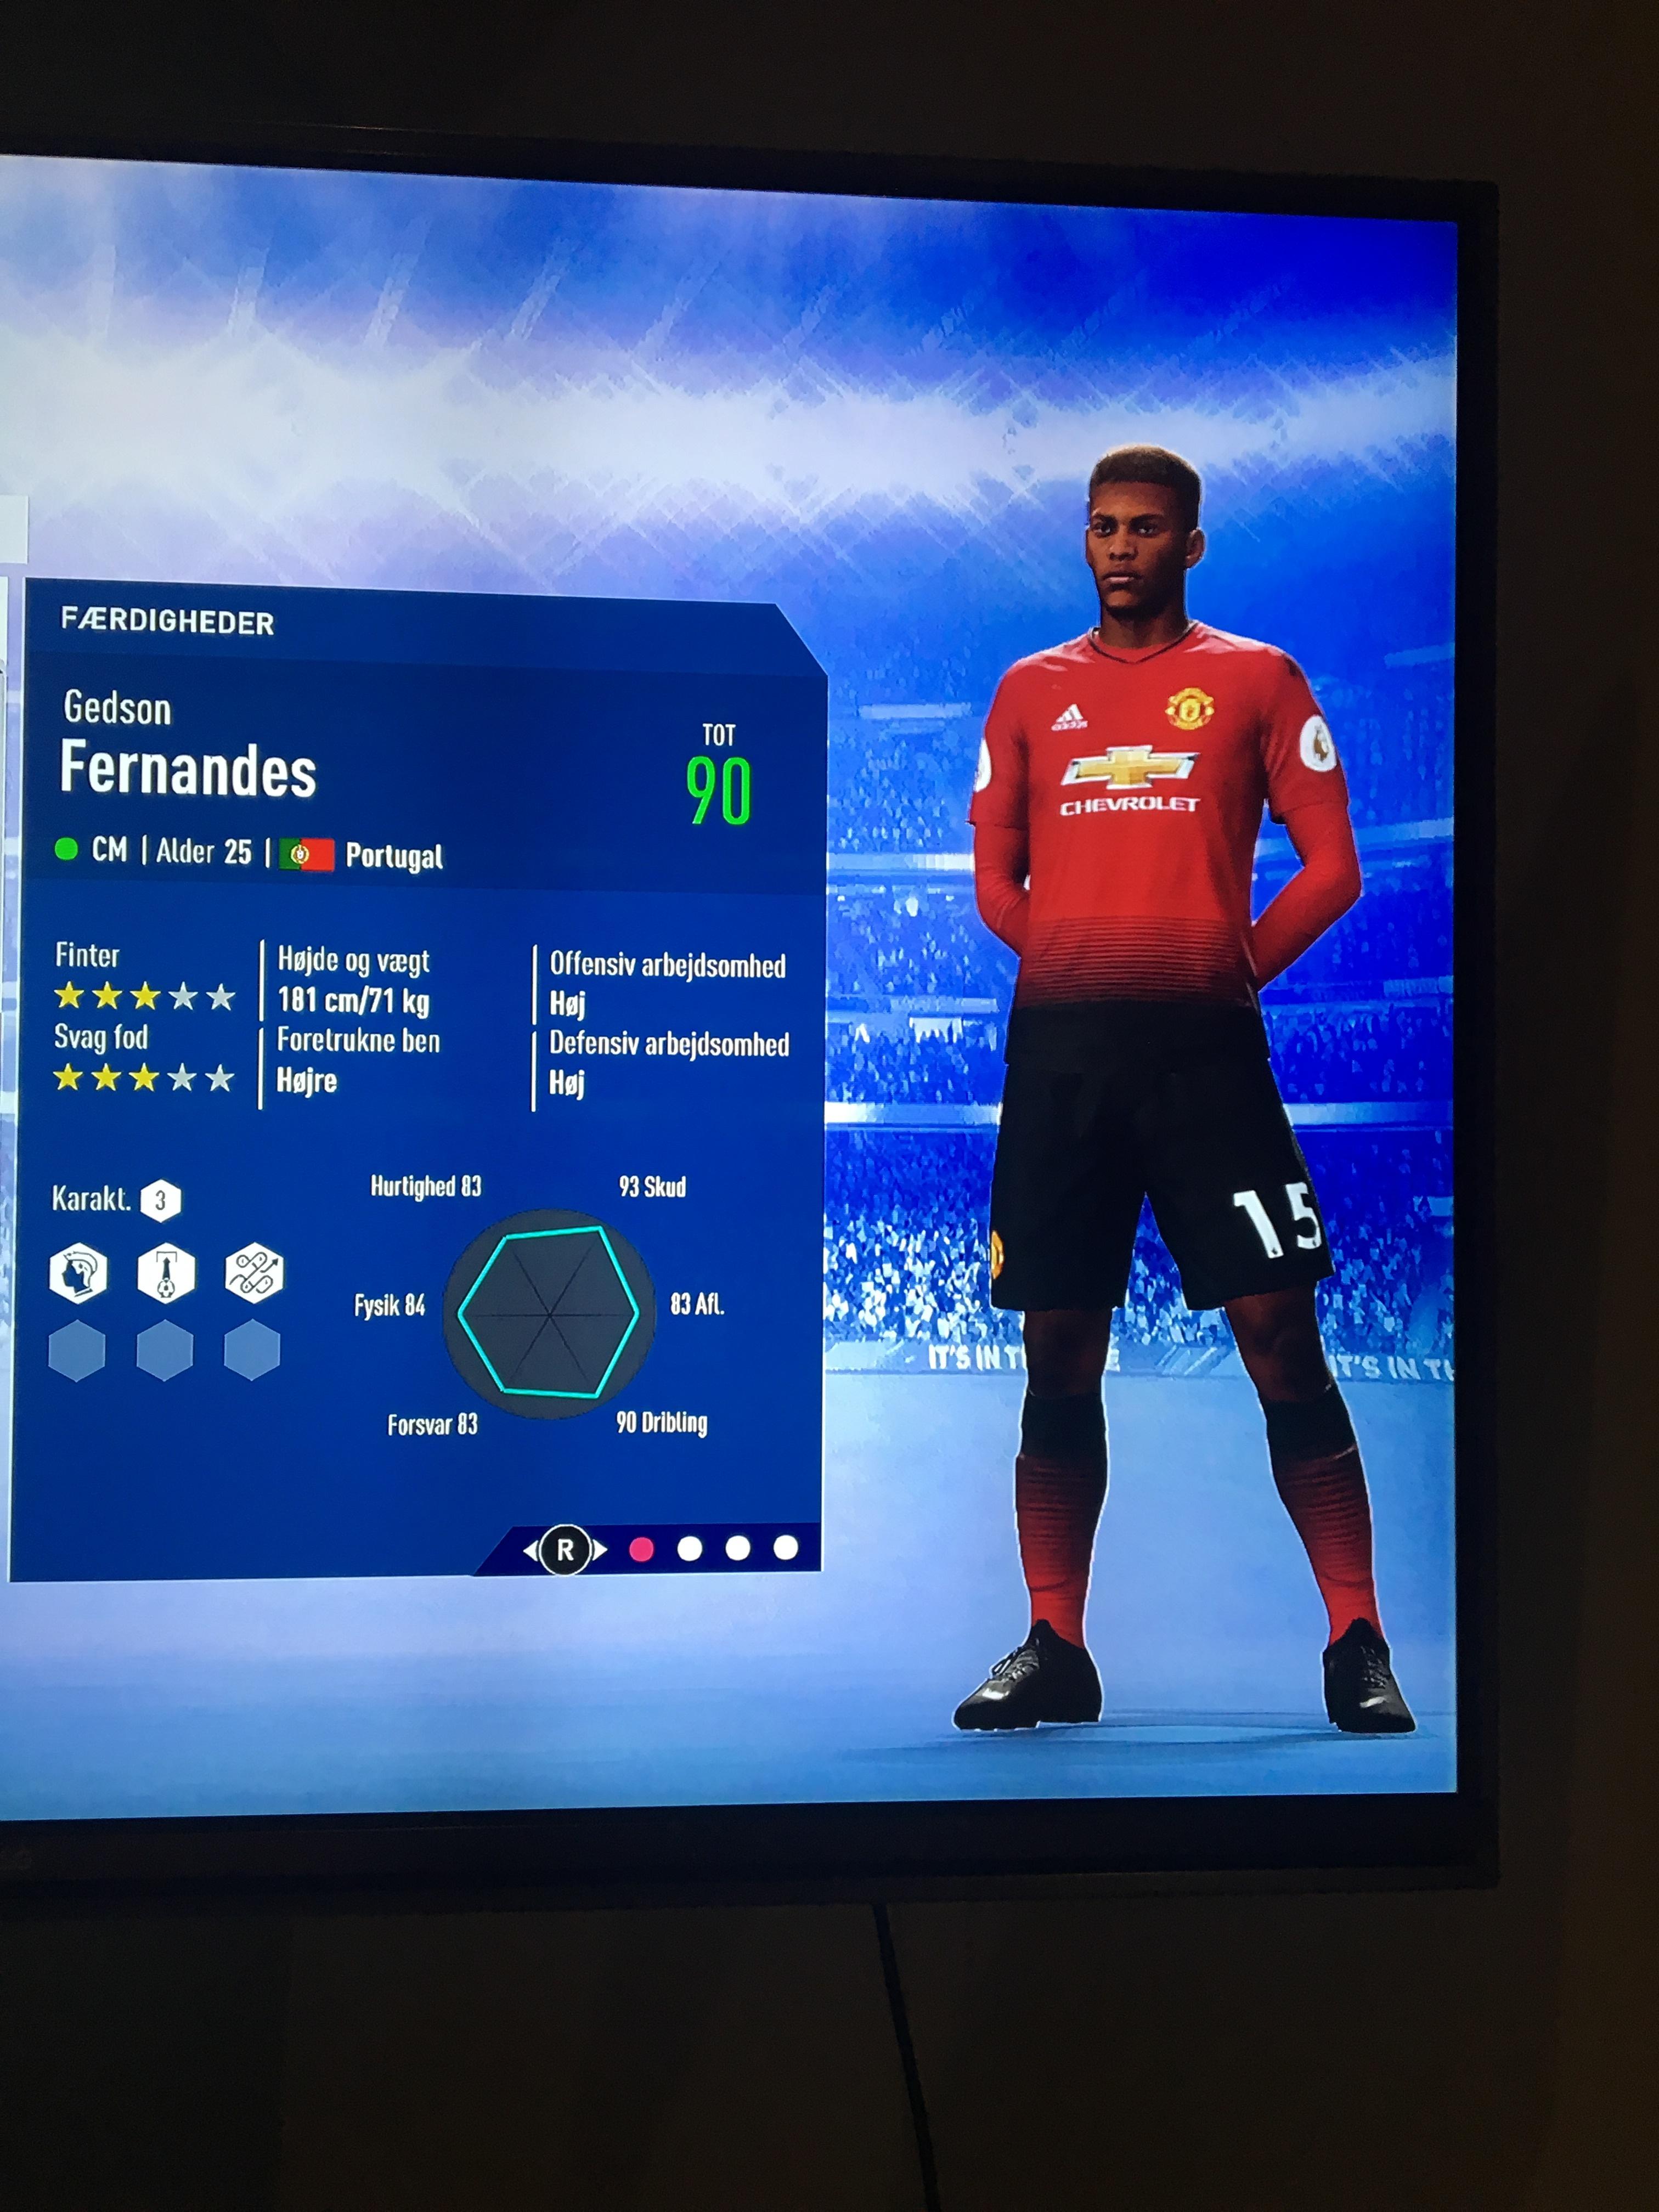 Gedson Fernandes FIFA 19 Jun 13, 2019 SoFIFA